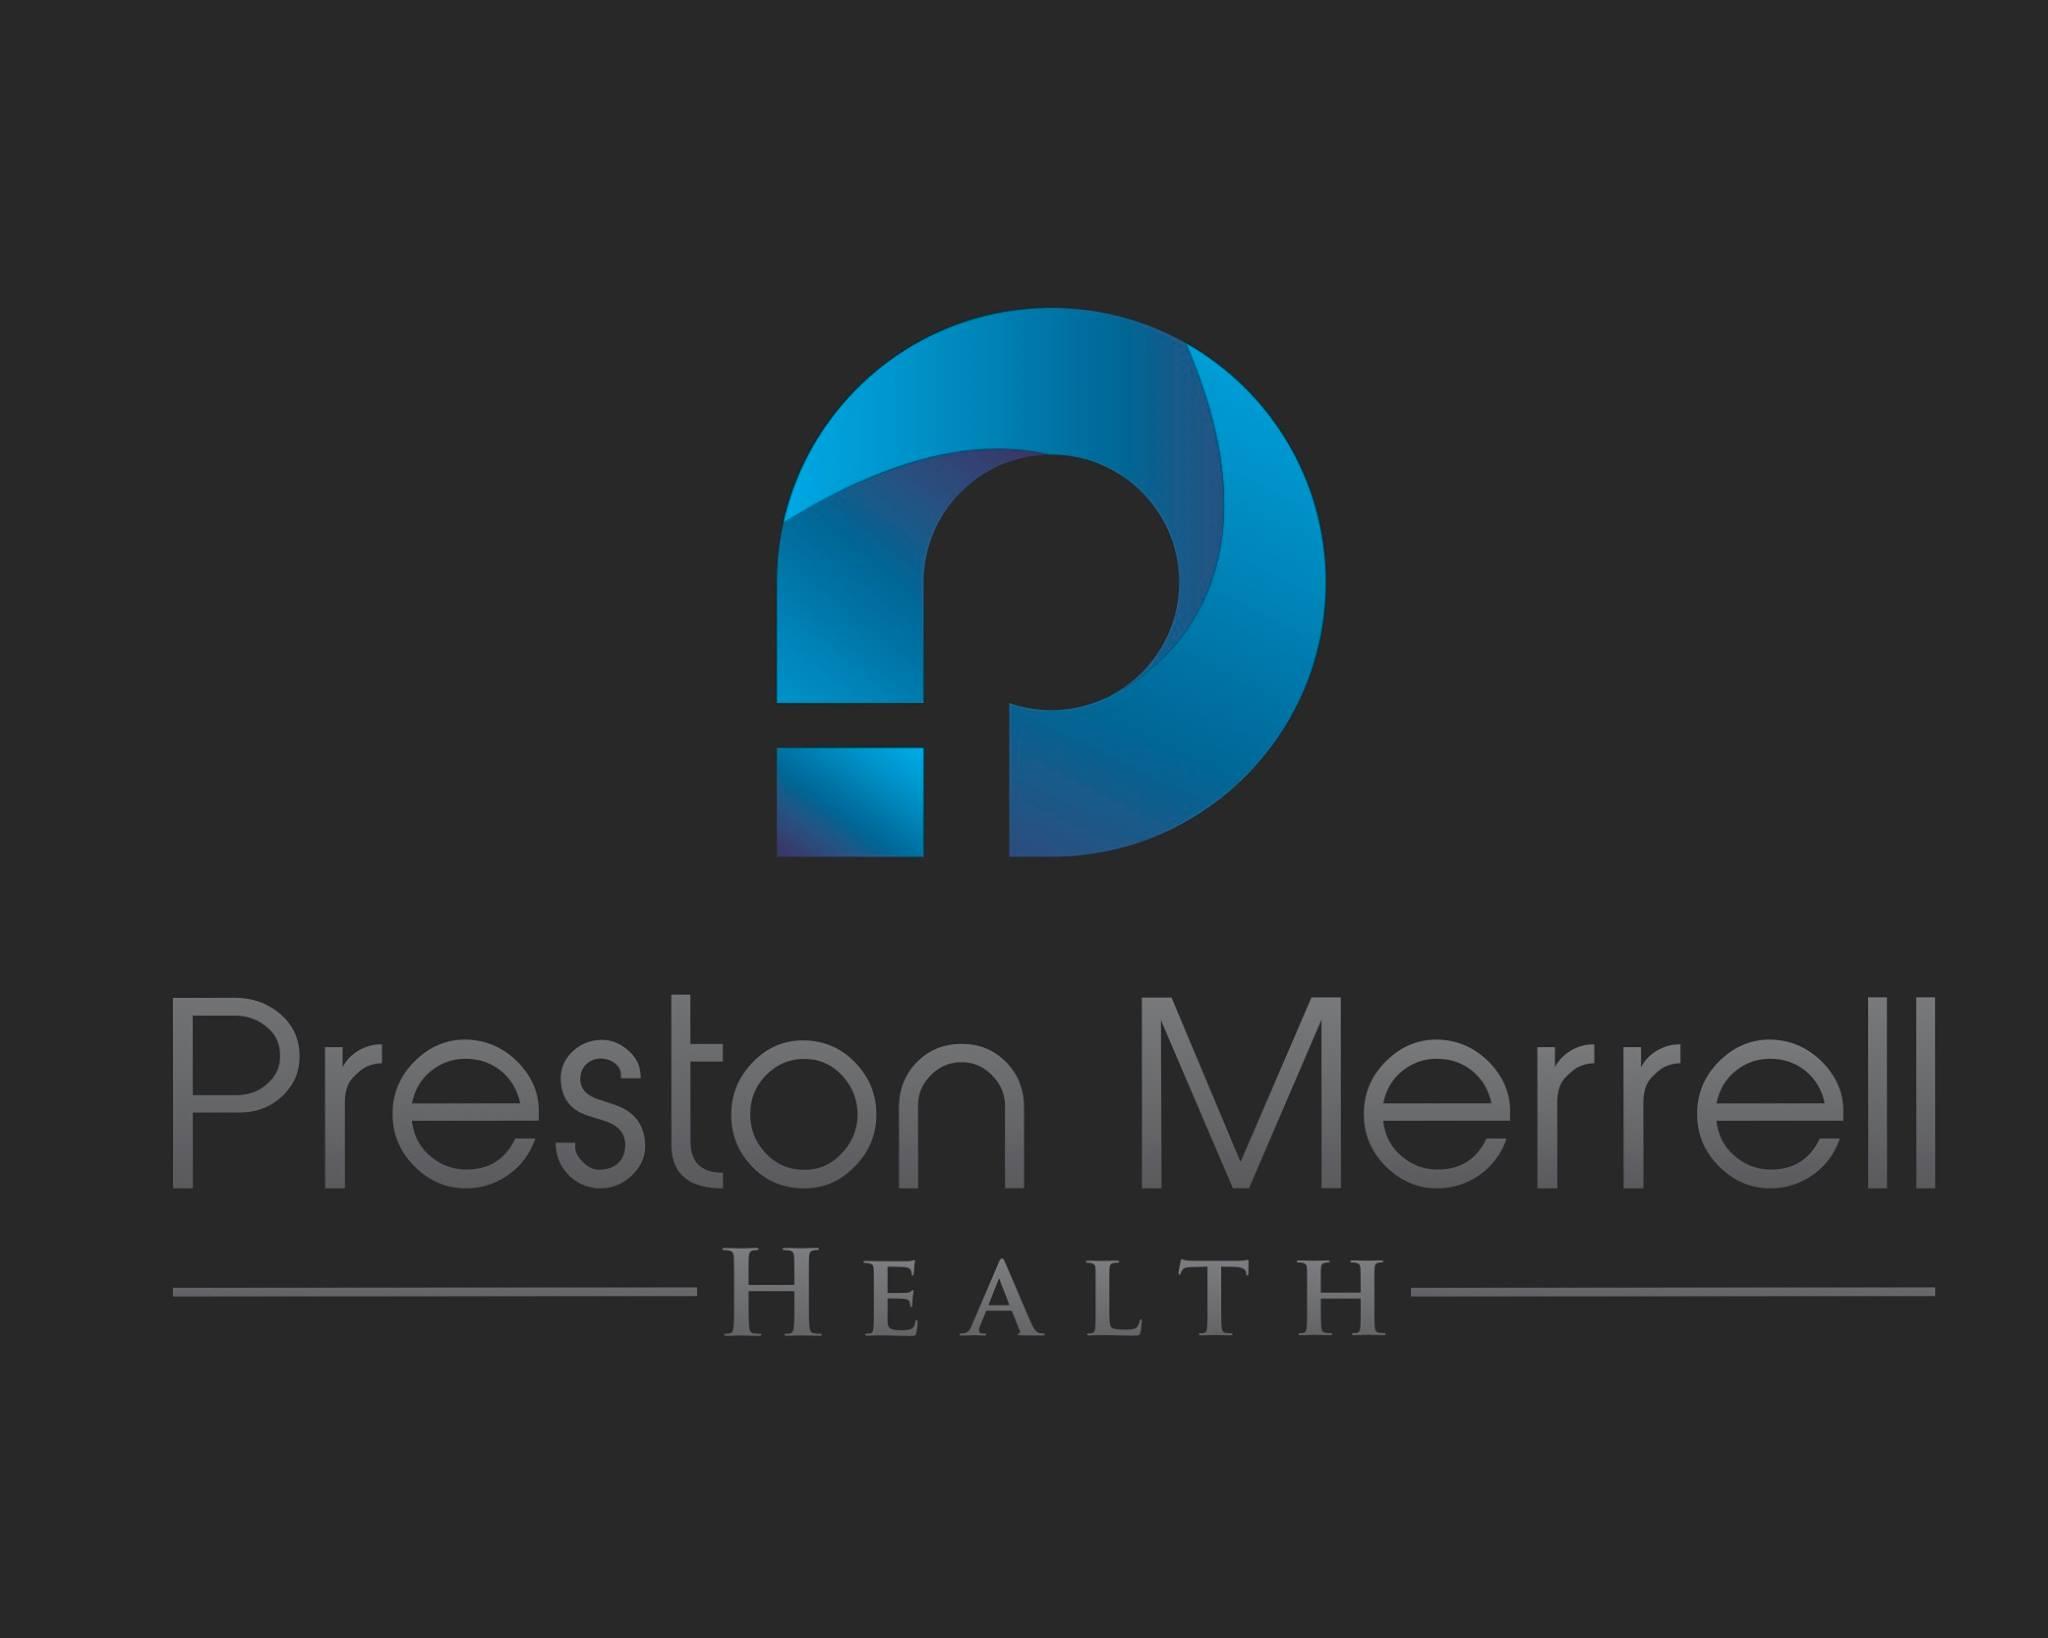 Preston Merrell Health logo